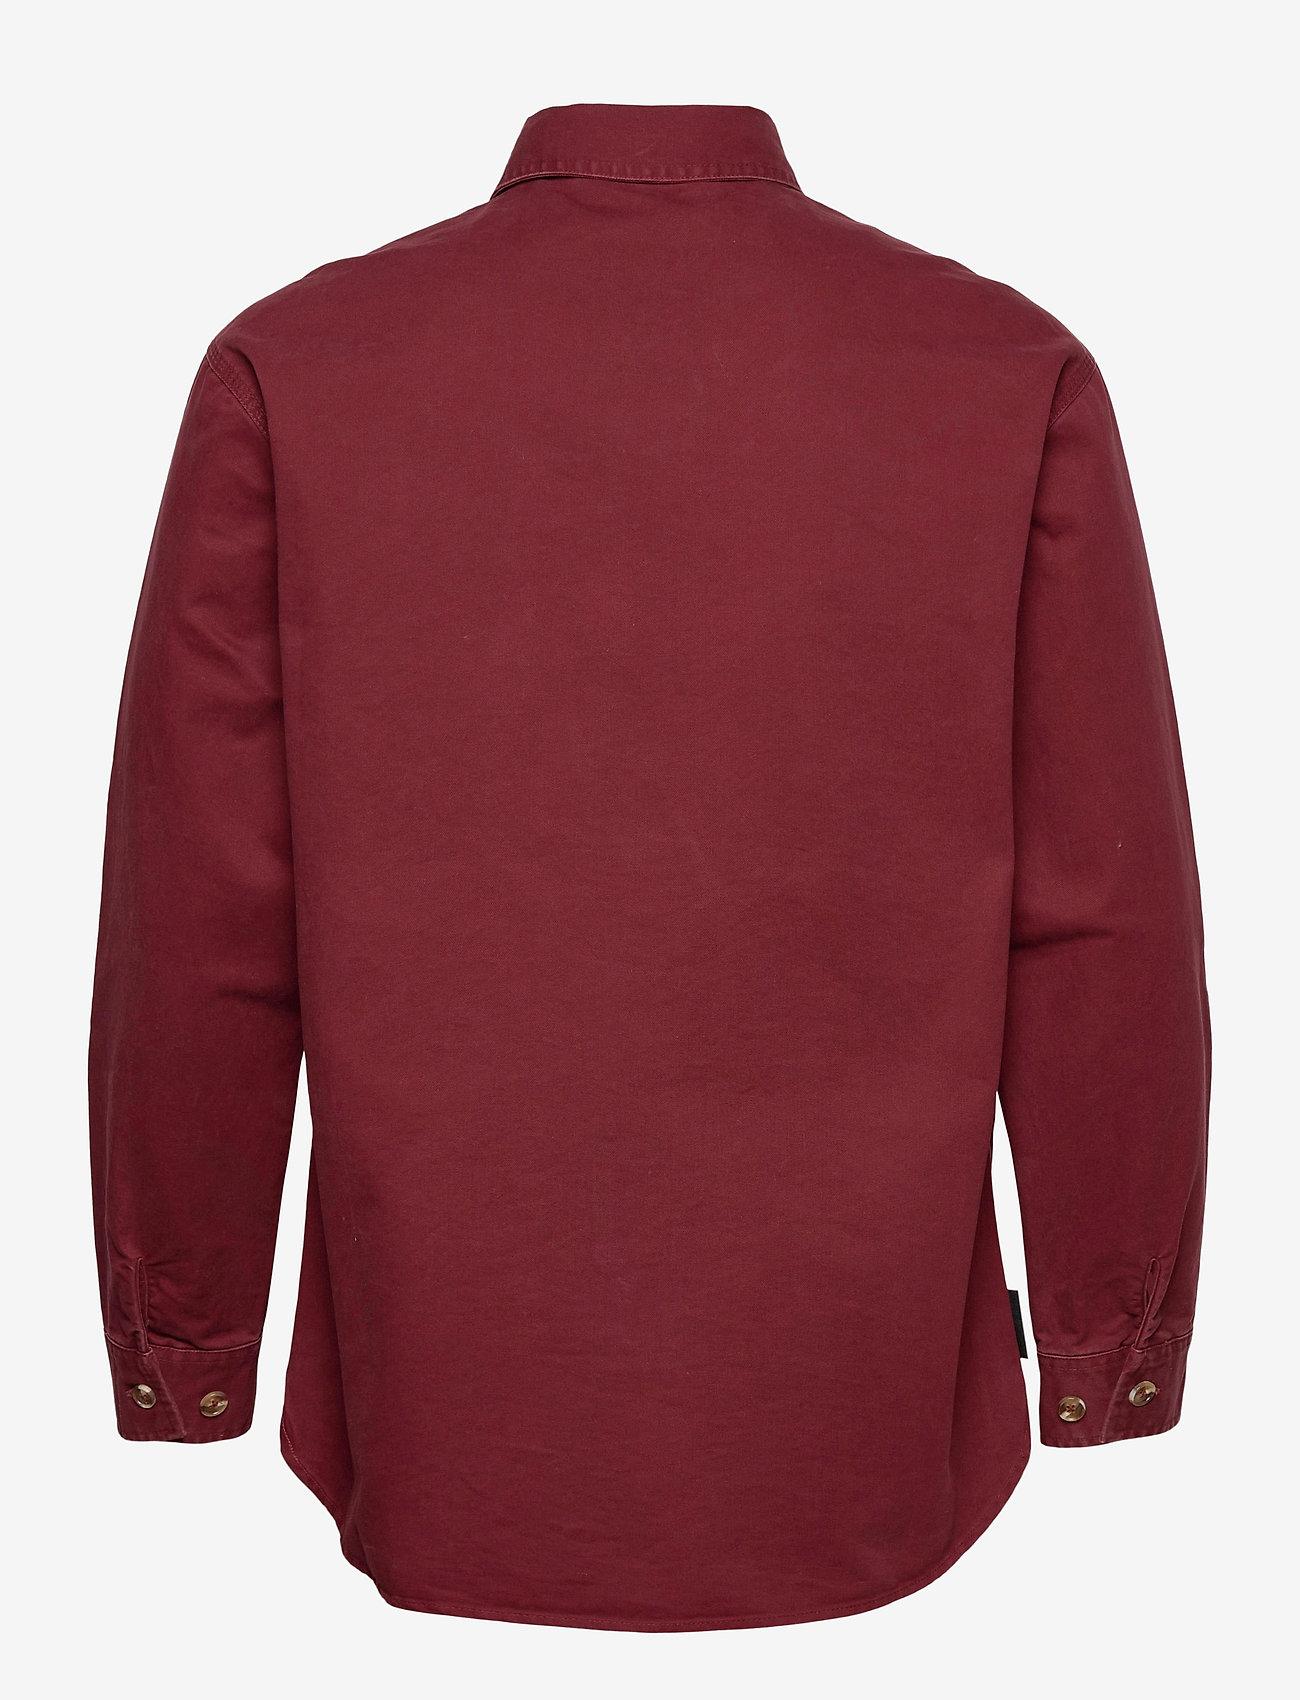 HAN Kjøbenhavn - Army Shirt - kleding - grey - 2